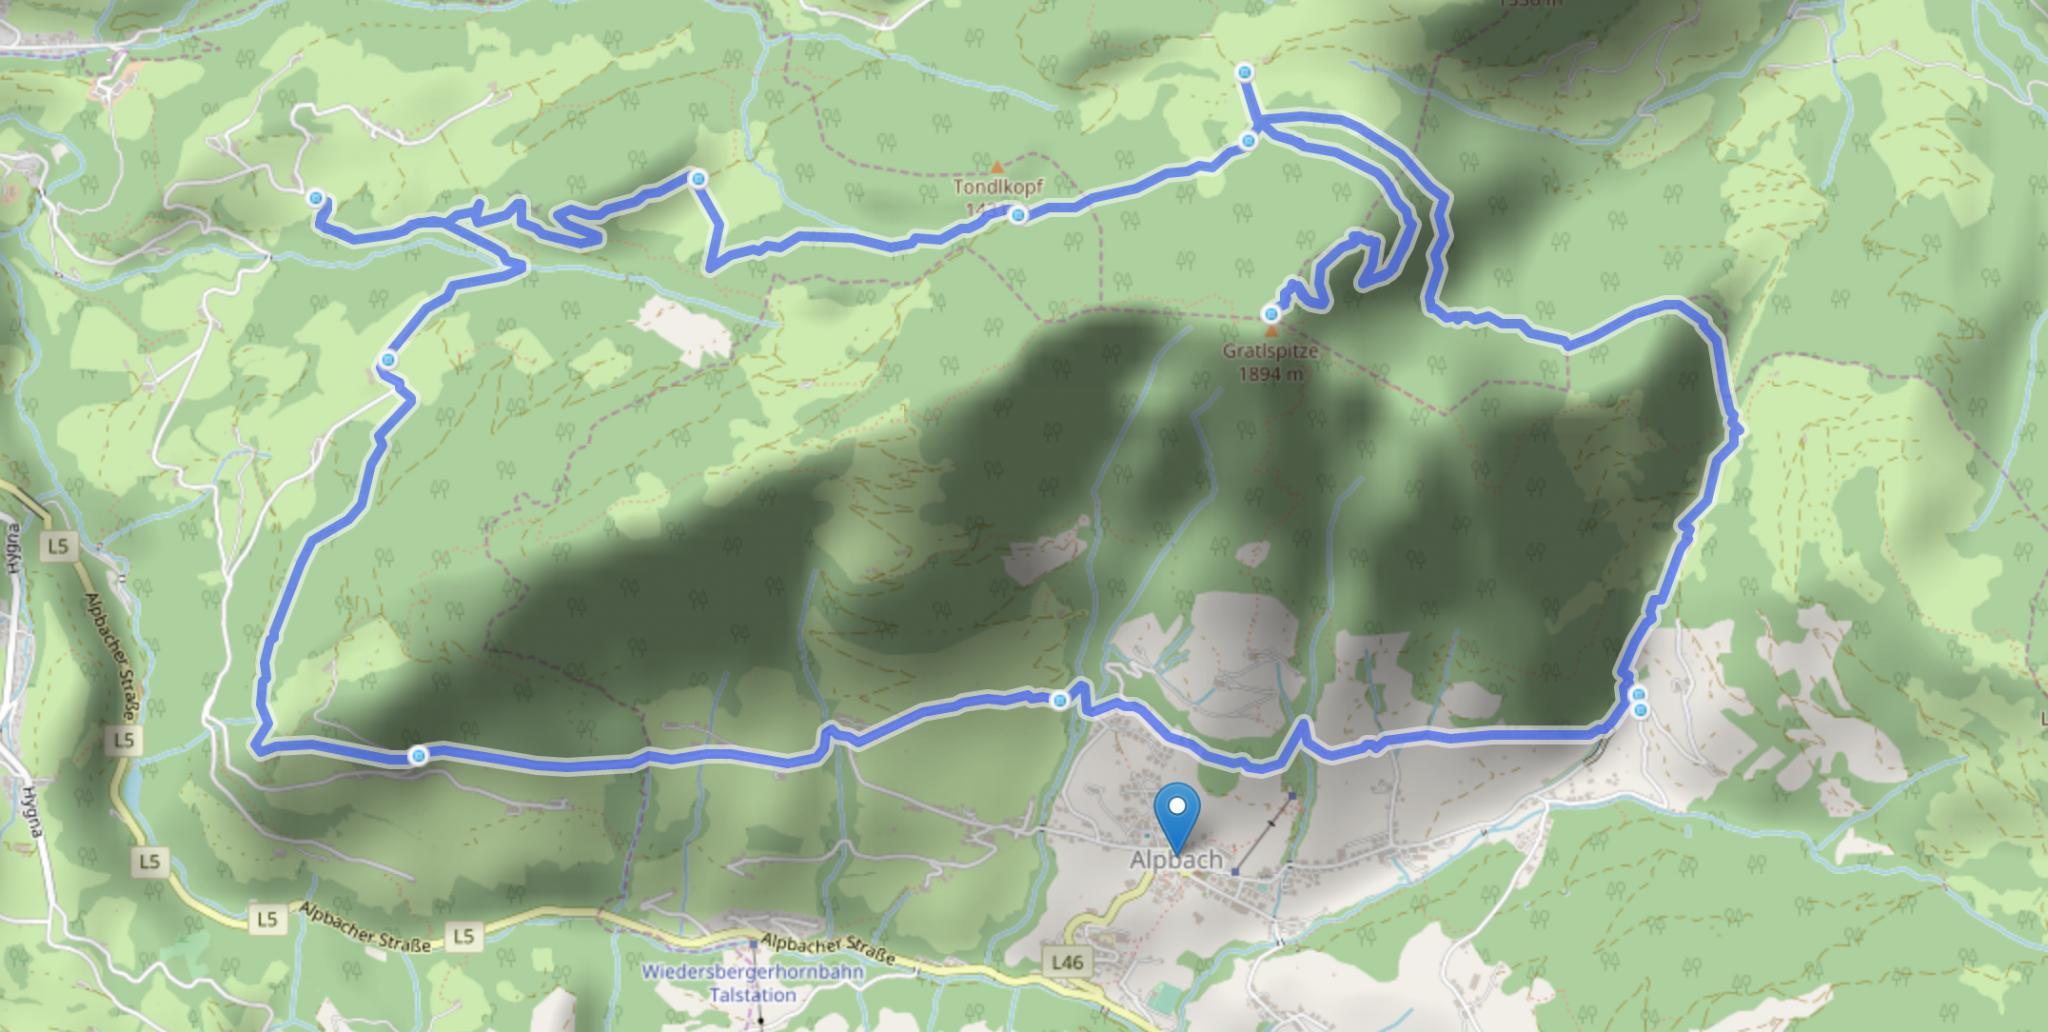 Tourverlauf Gratlspitze Alpbachtal